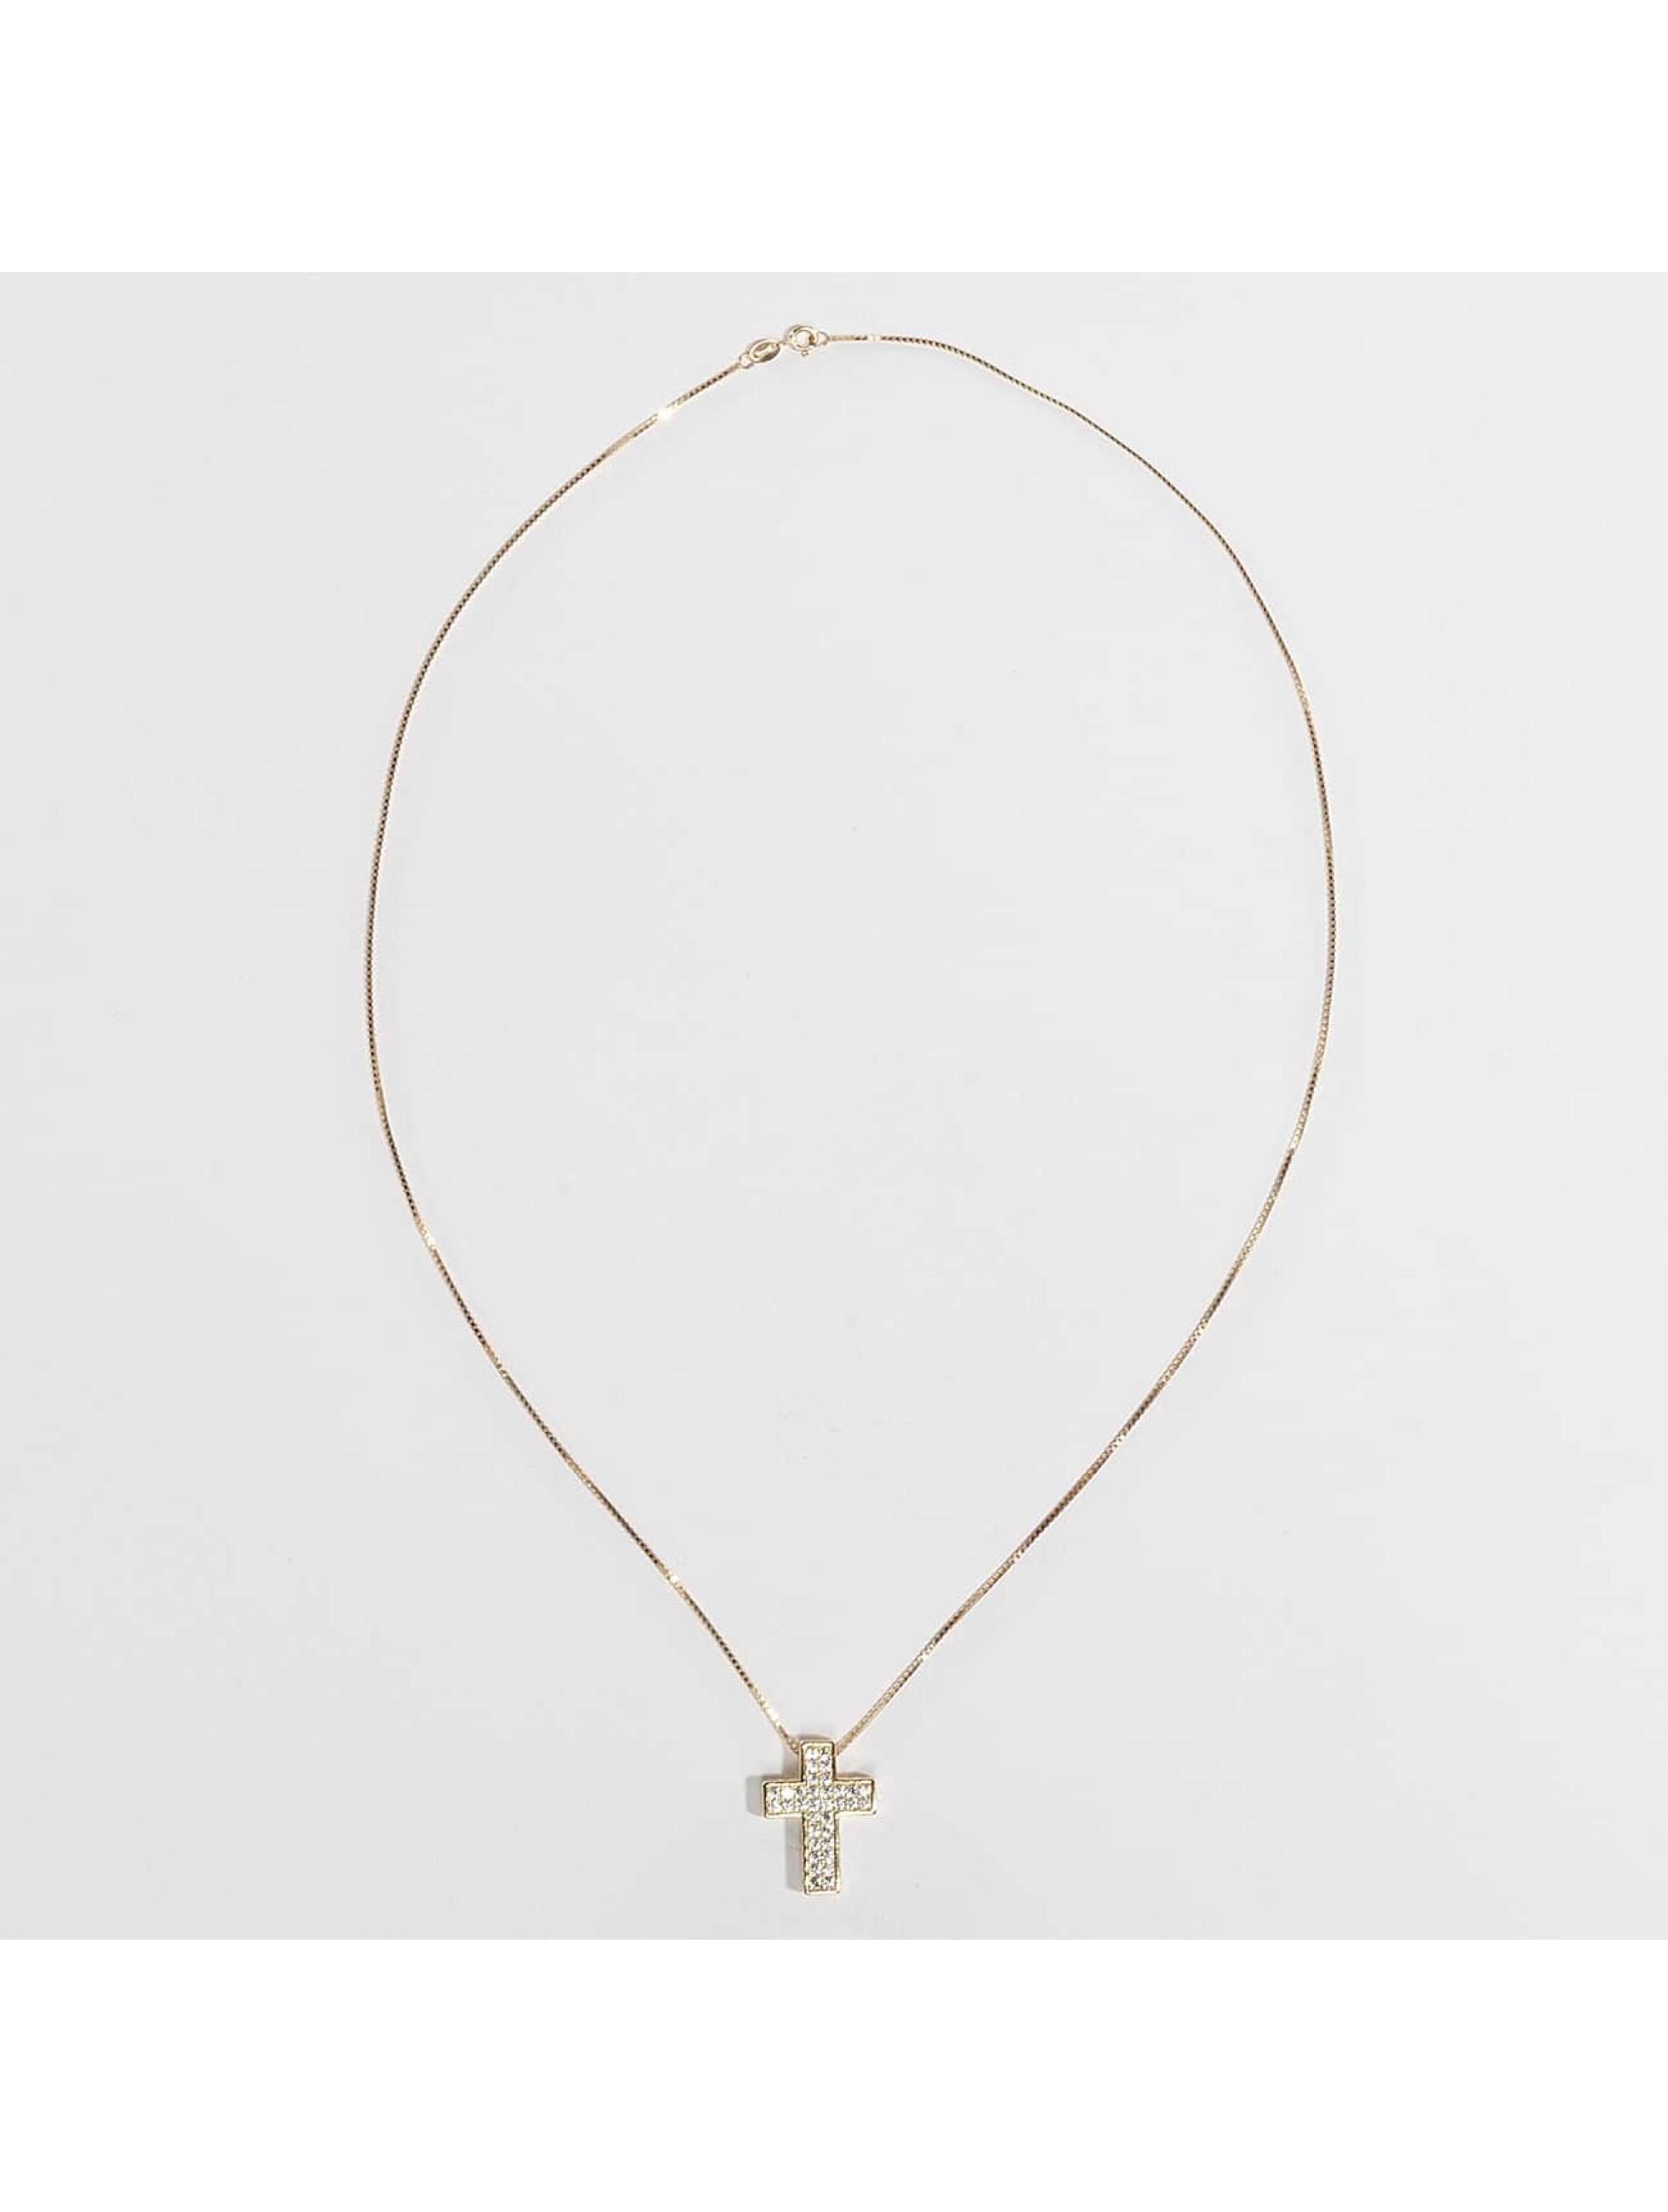 KING ICE Retiazky Gold_Plated CZ 925 Sterling_Silver Dime Cross zlatá